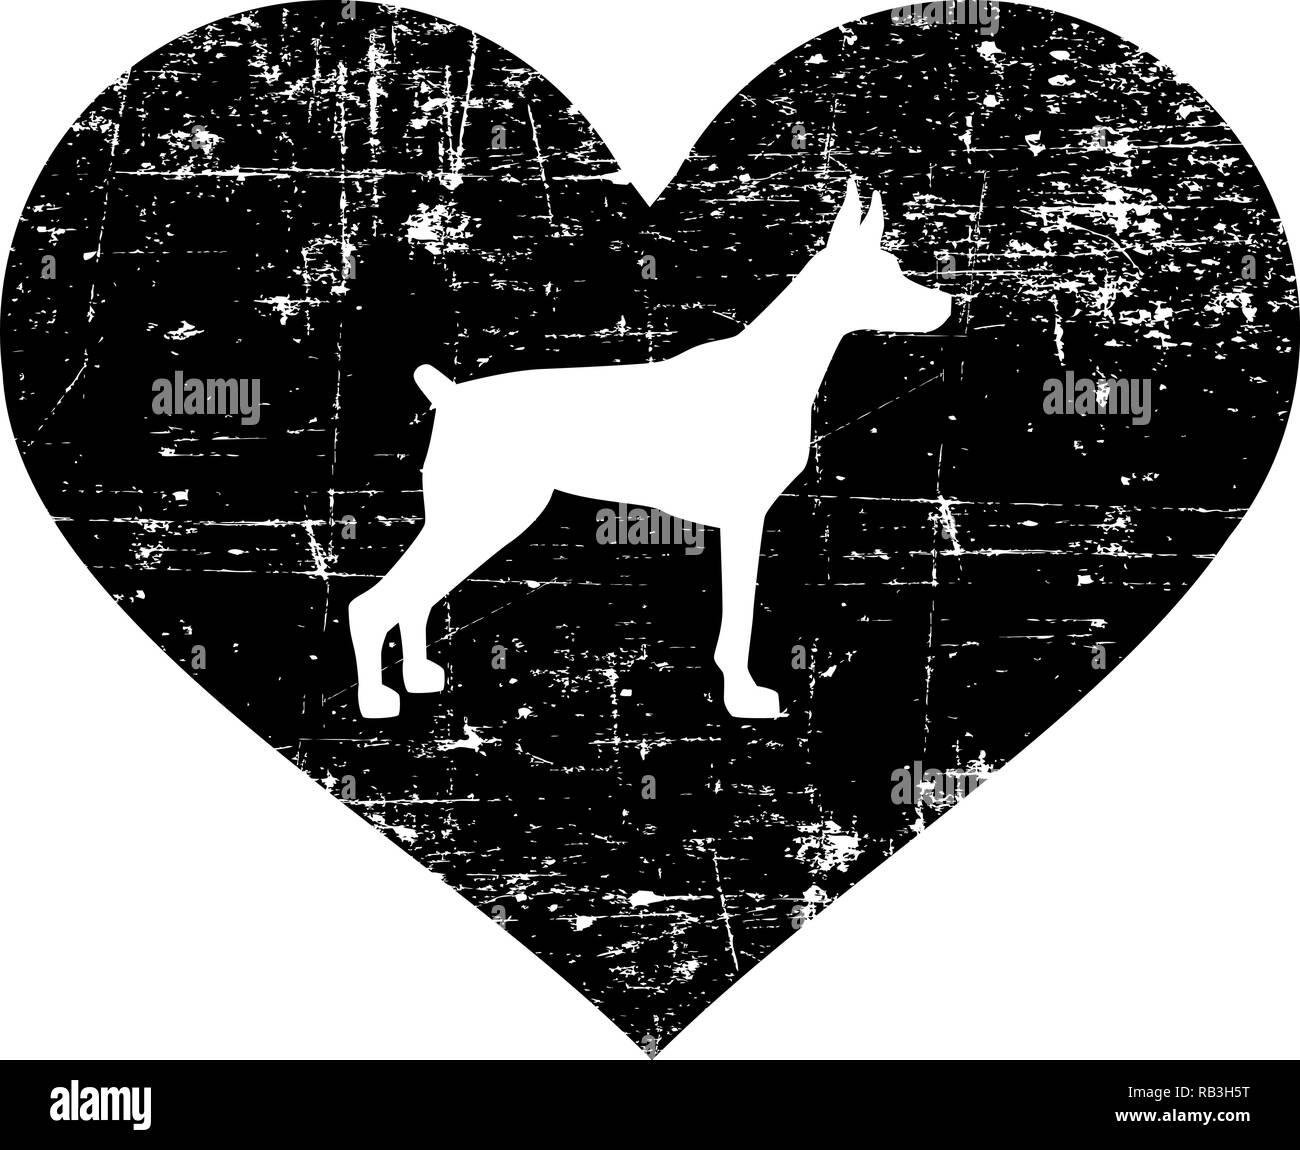 Doberman silhouette in black heart - Stock Image